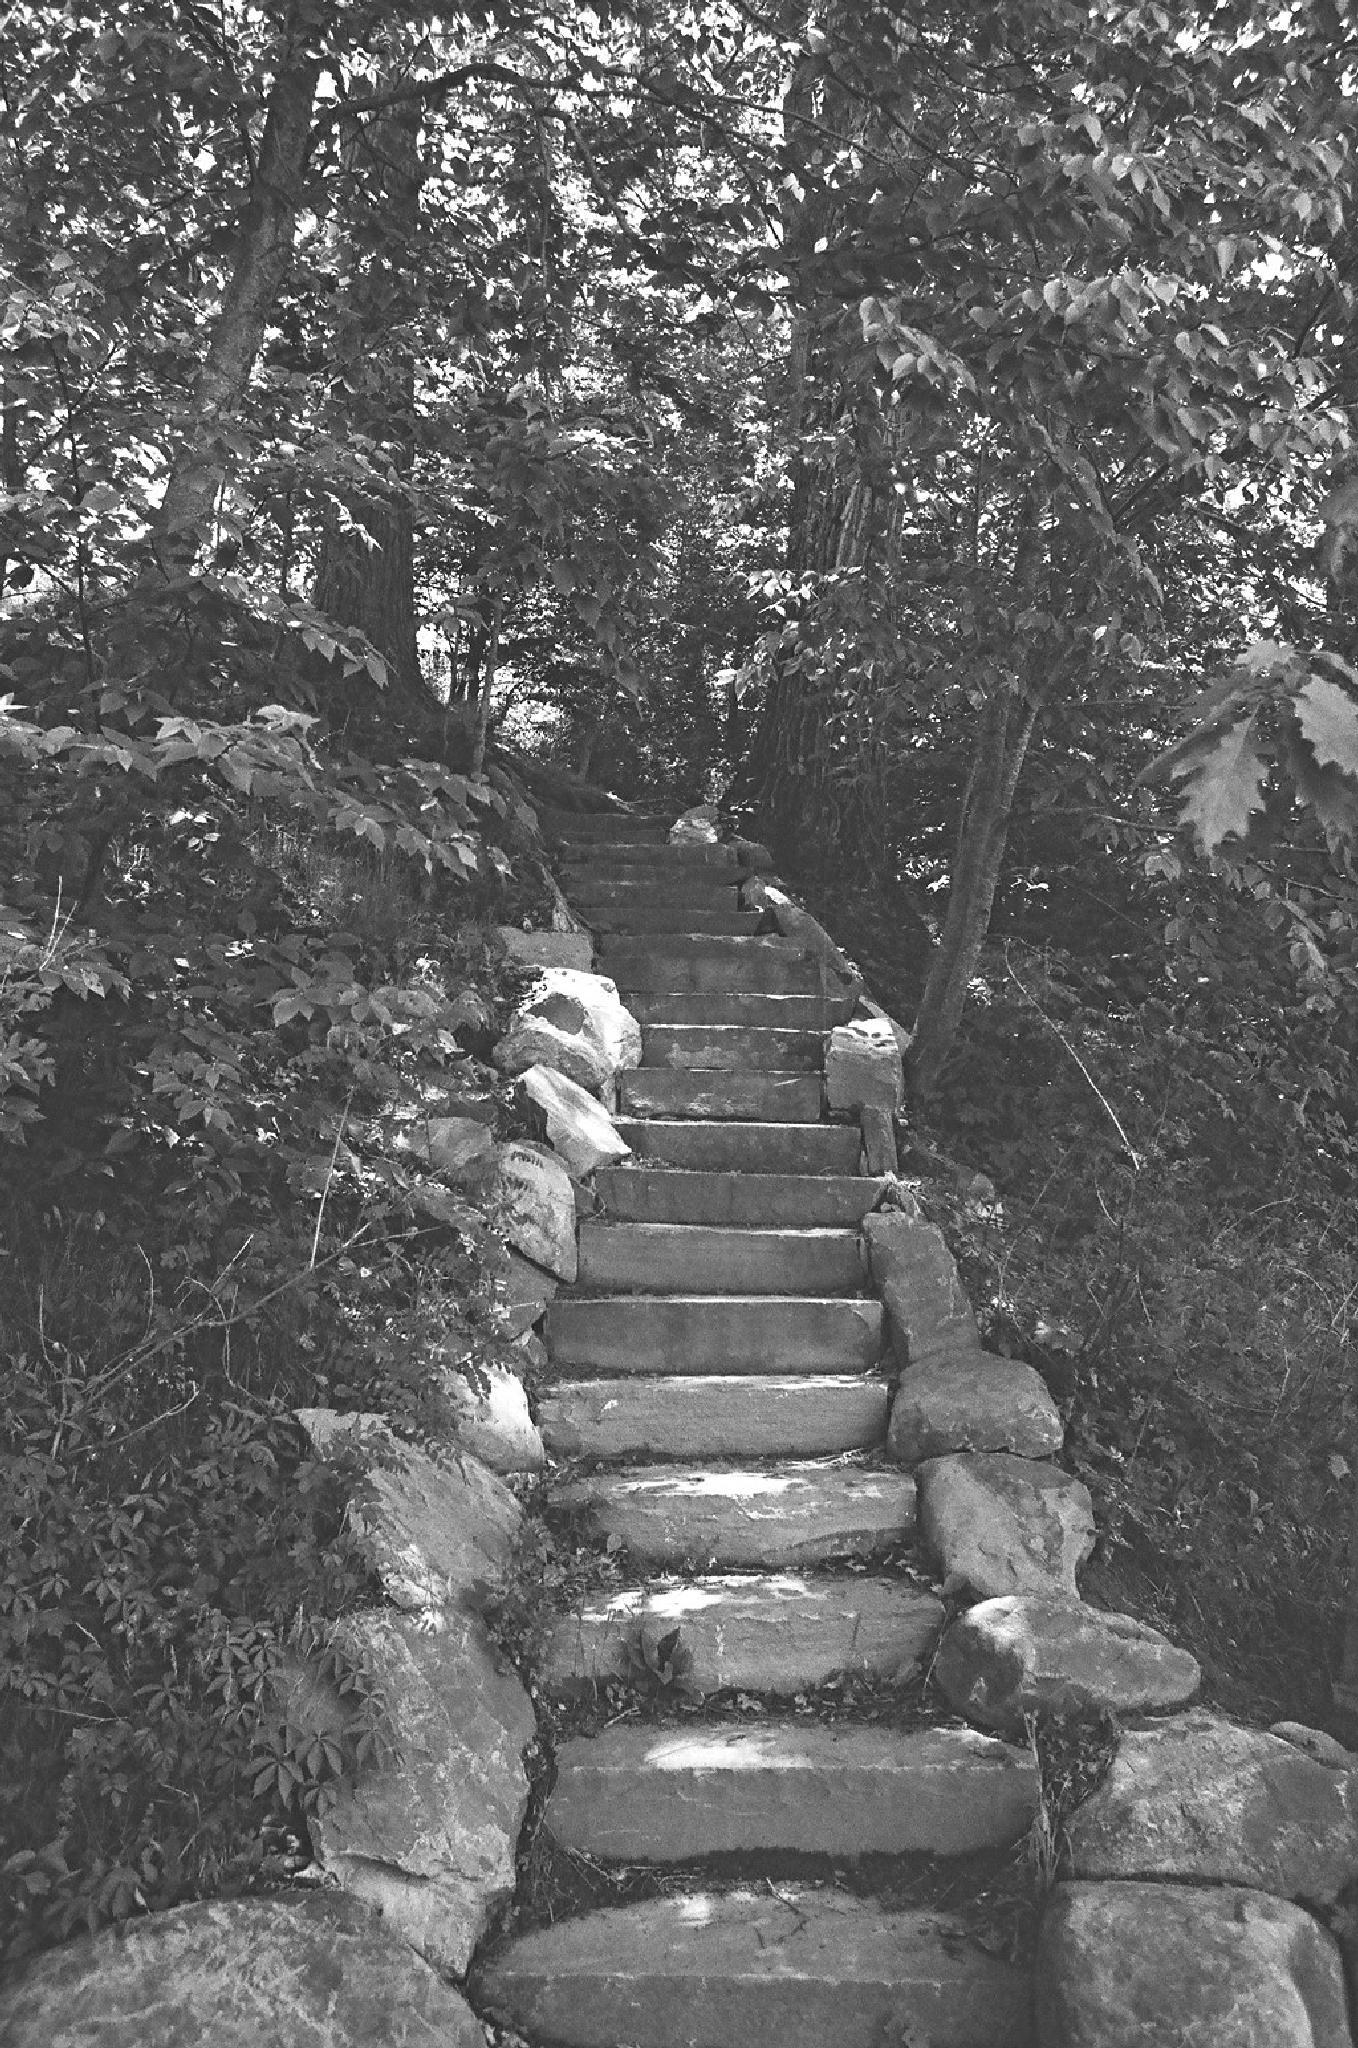 Pathway by Fog_Battleship_Amagi